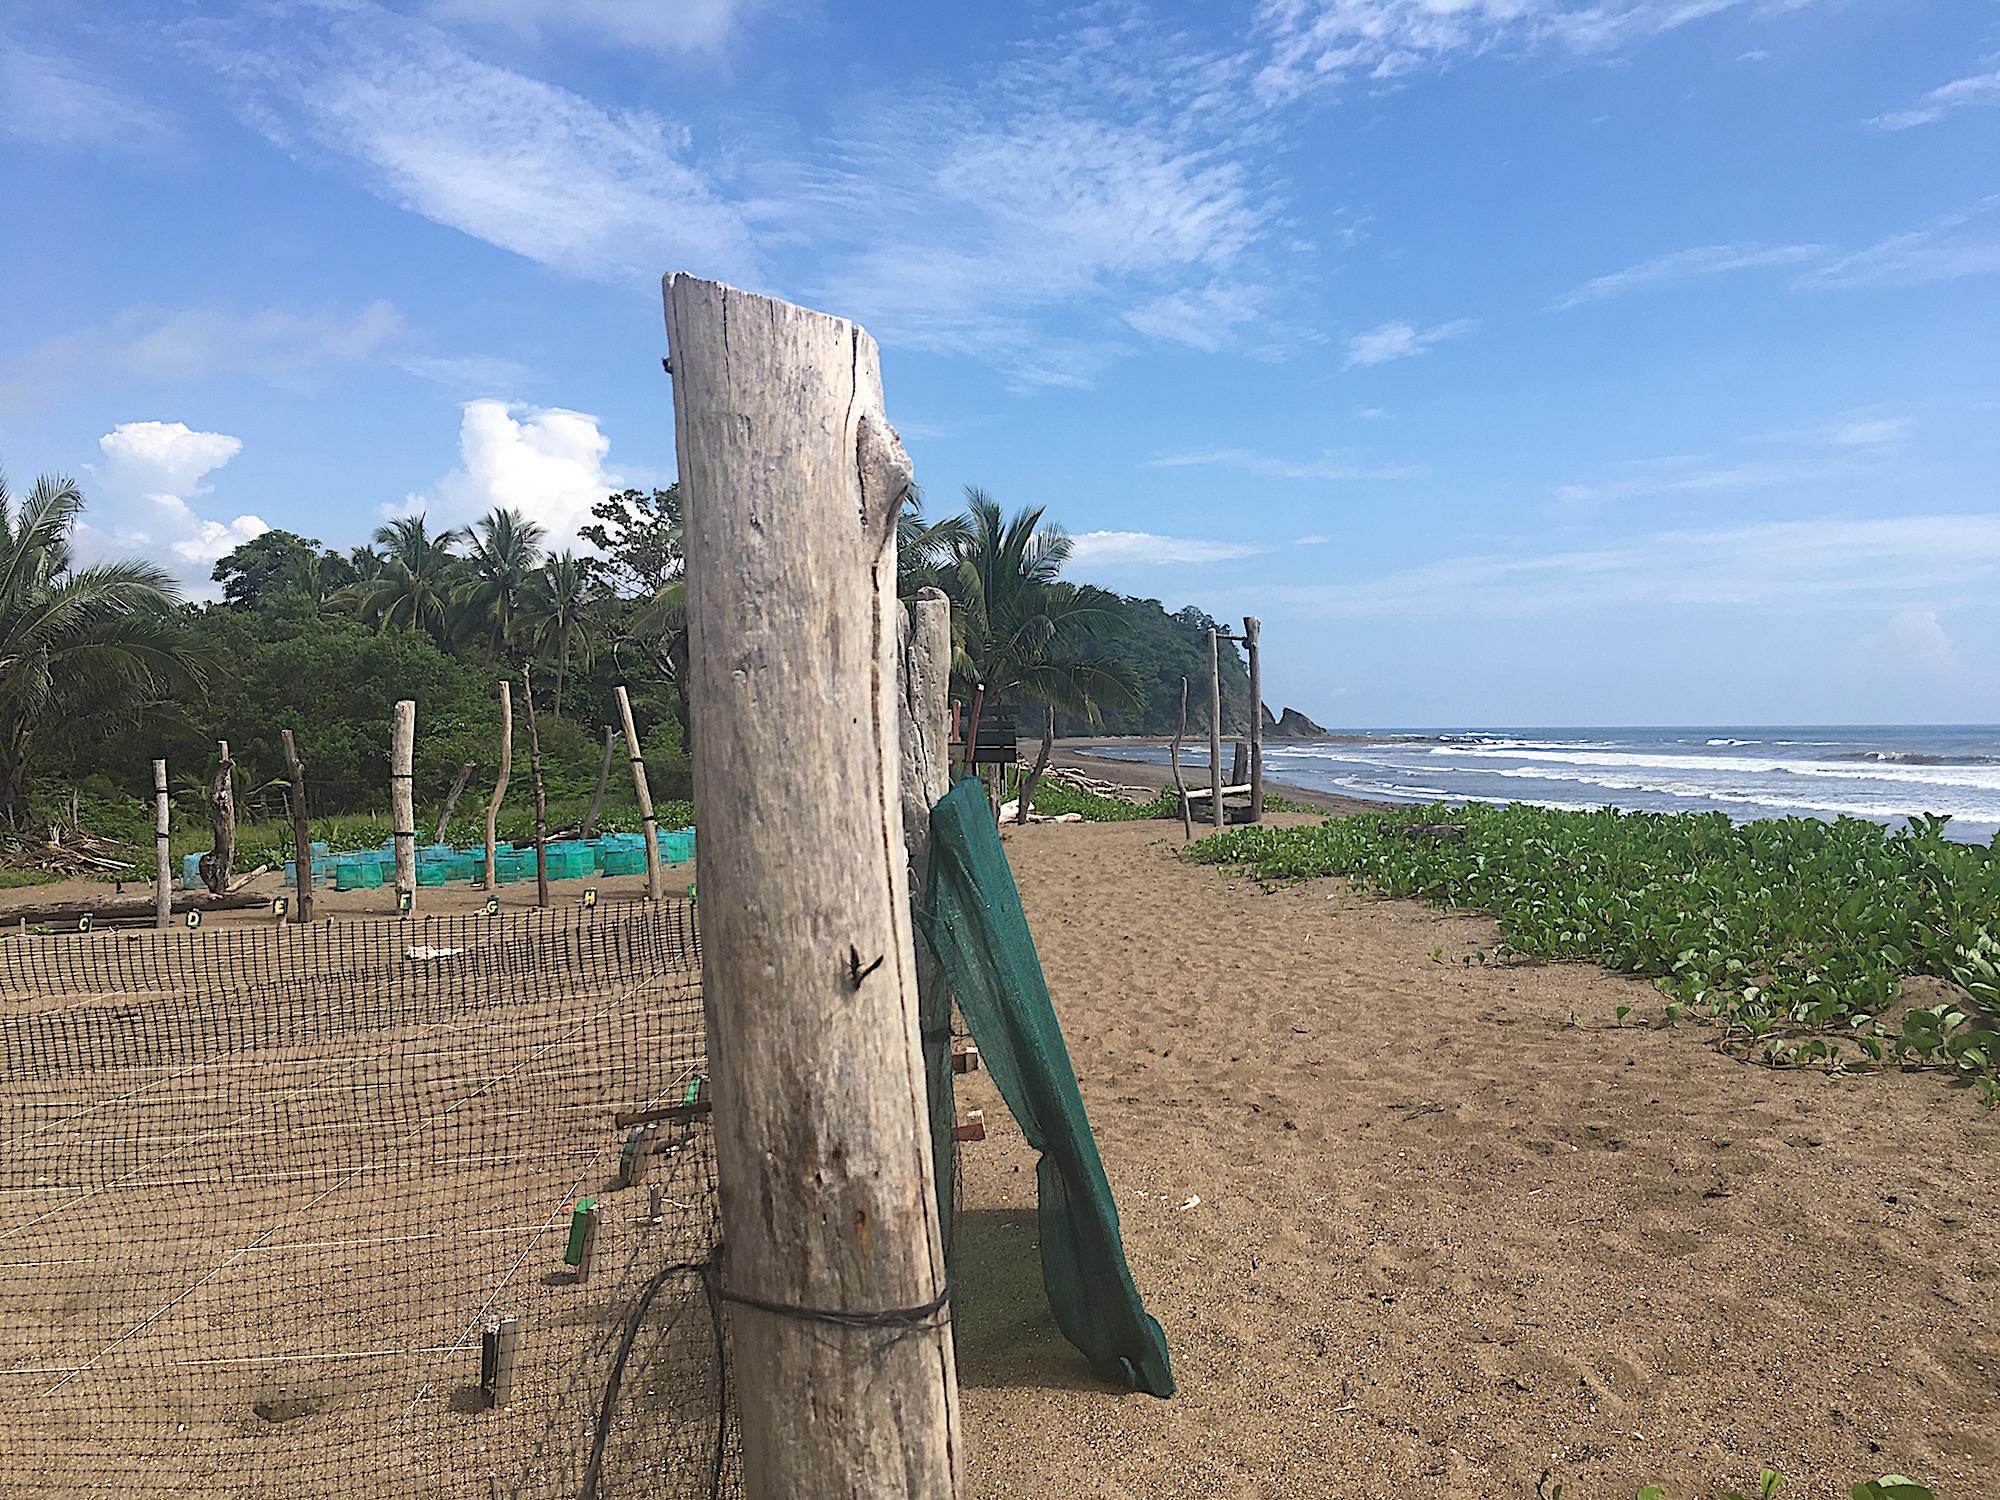 Naturschutz Costa Rica